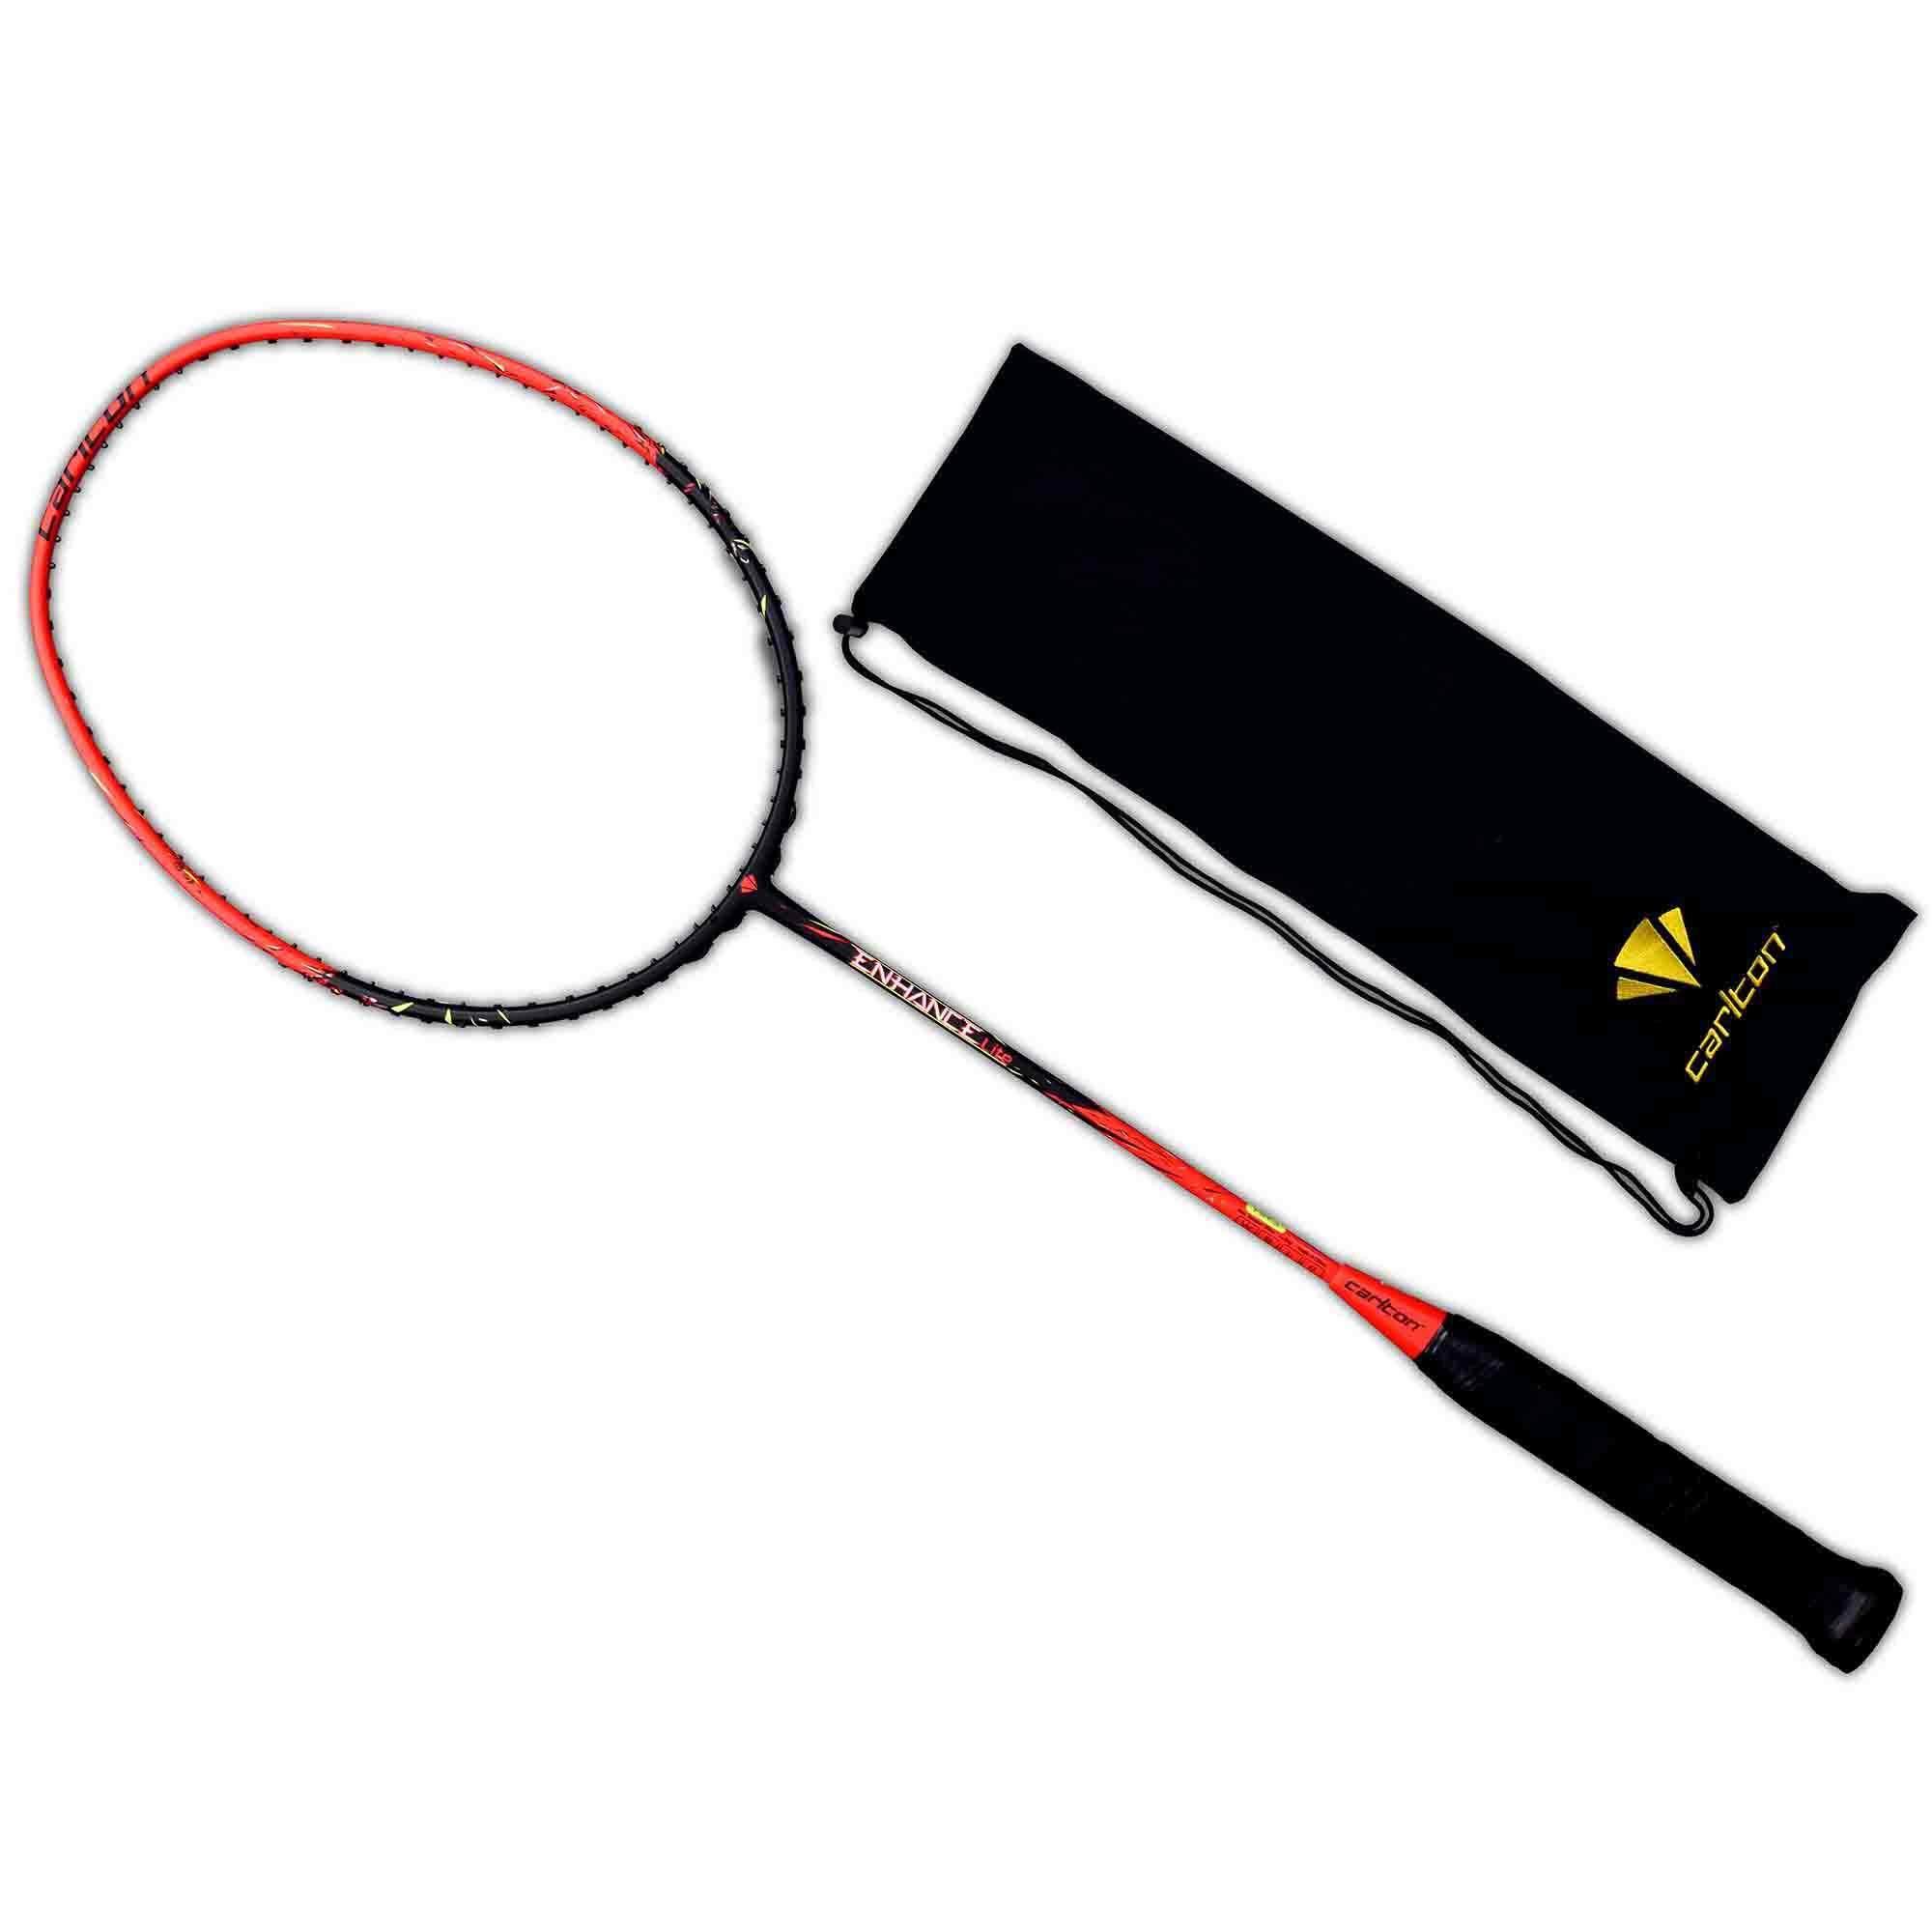 Carlton Badminton Racket Enhance Lite